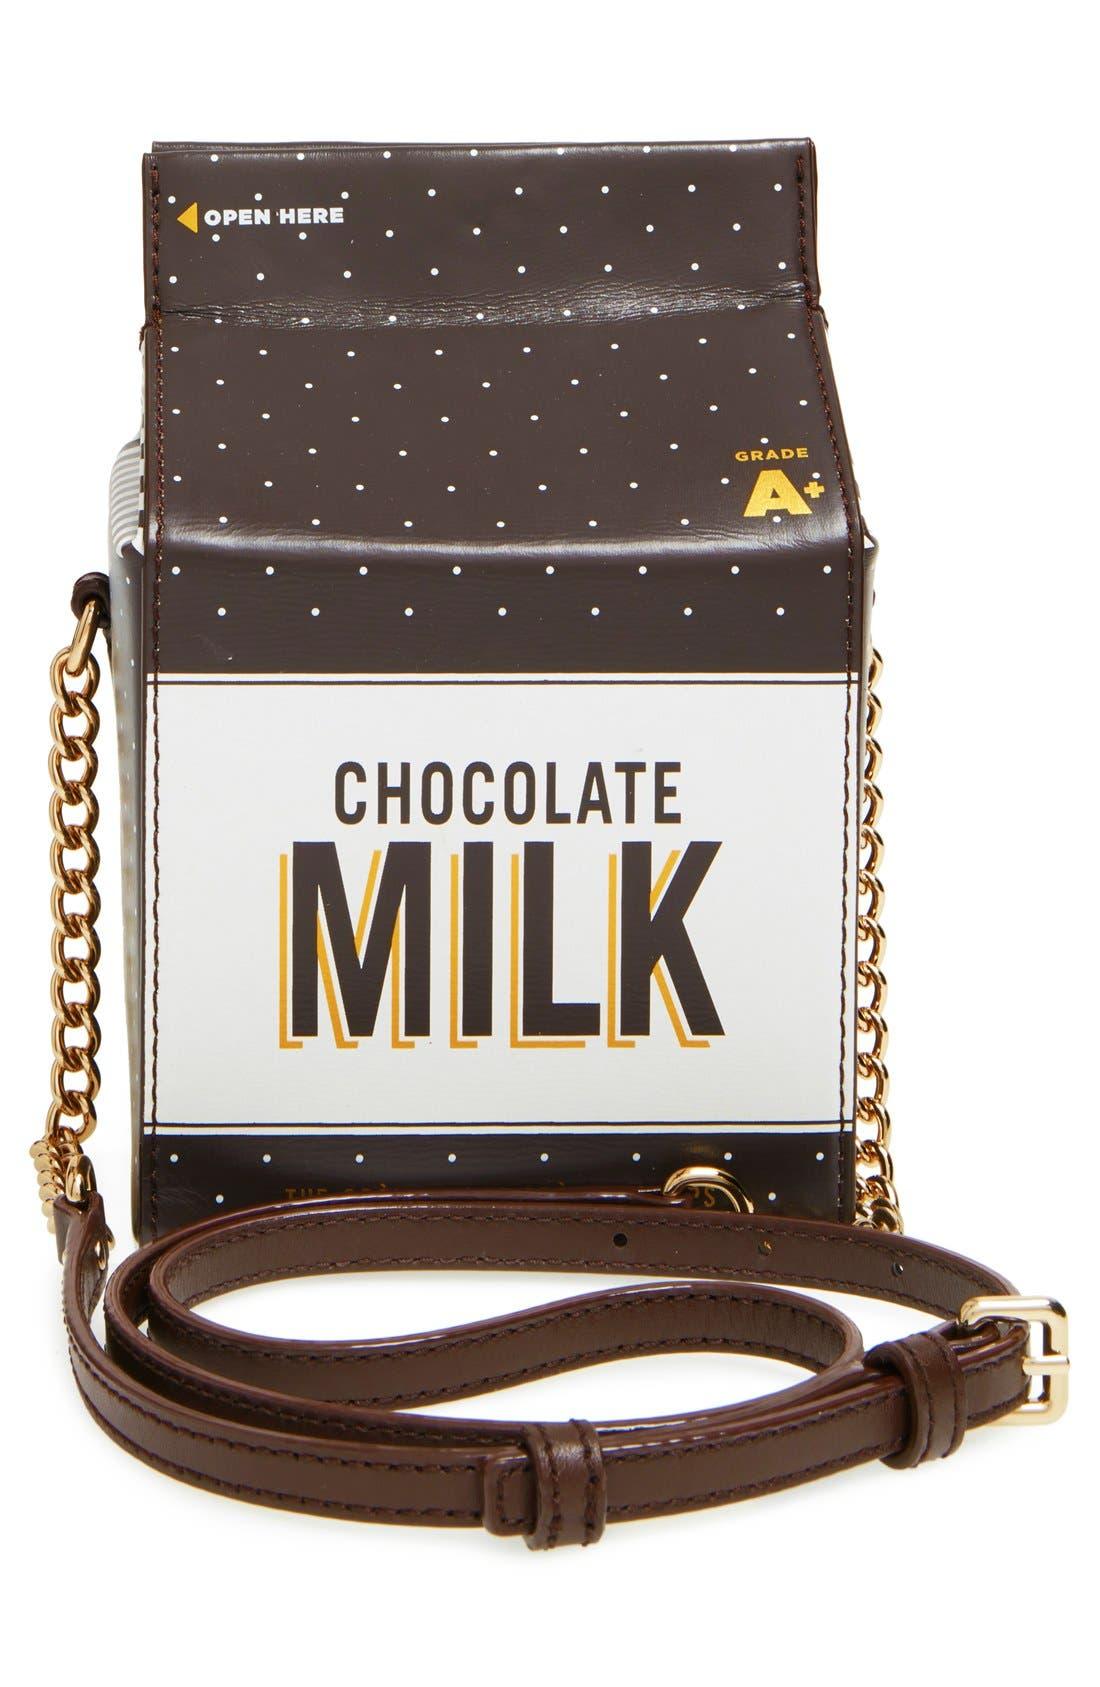 KATE SPADE NEW YORK,                             'de la crème' milk container crossbody bag,                             Alternate thumbnail 3, color,                             974